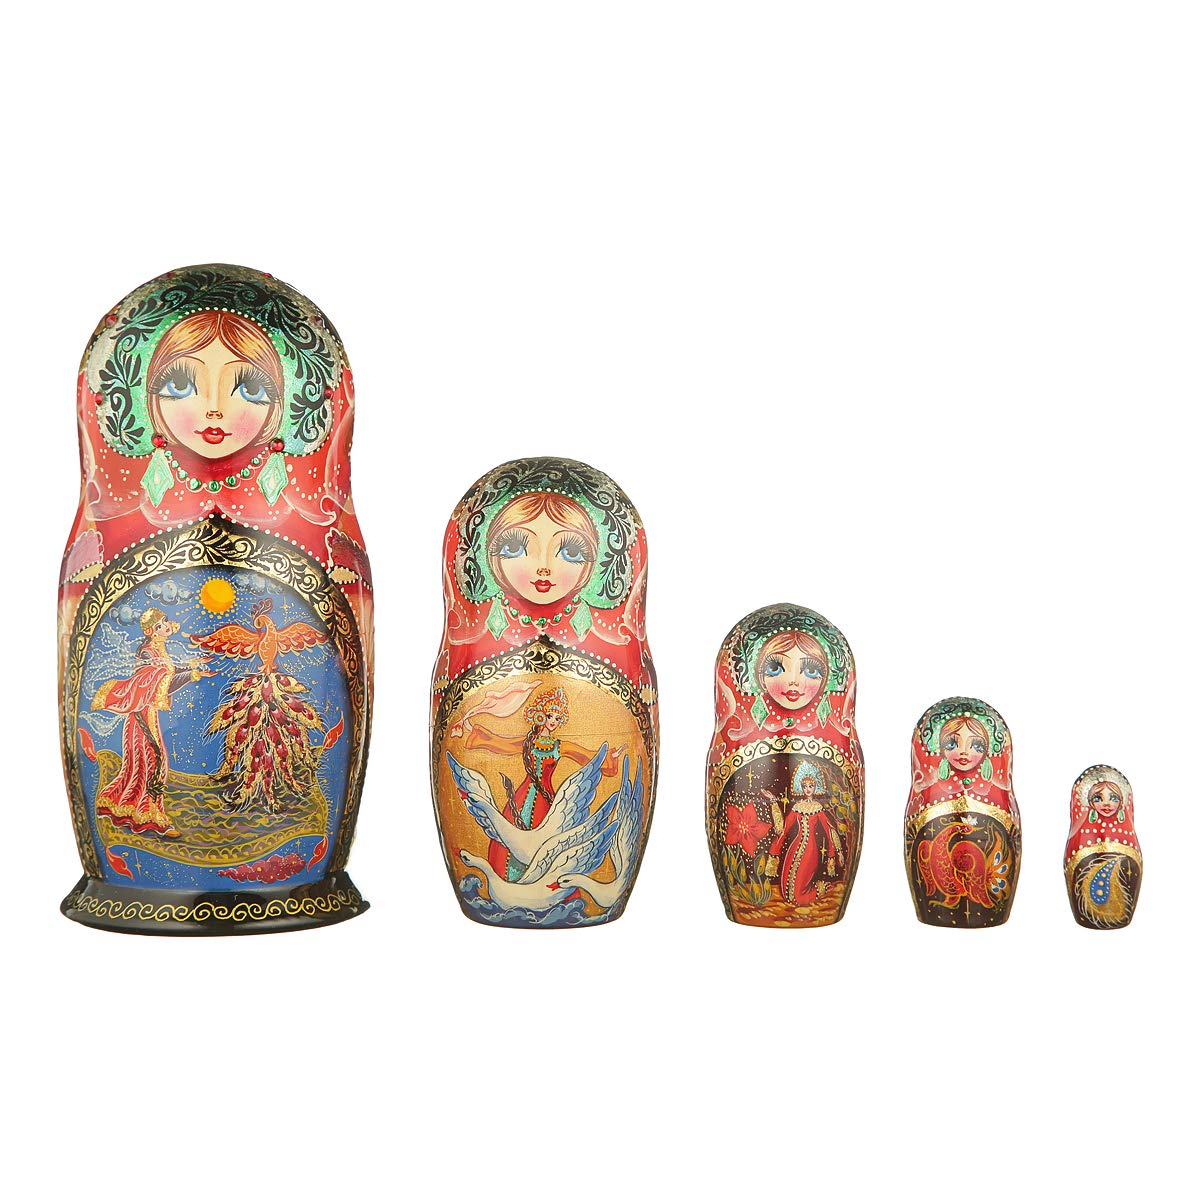 danila-souvenirs Russian Wooden Nesting Dolls Hand Painted Matryoshka 5 pcs Set Fairy Tale 6''